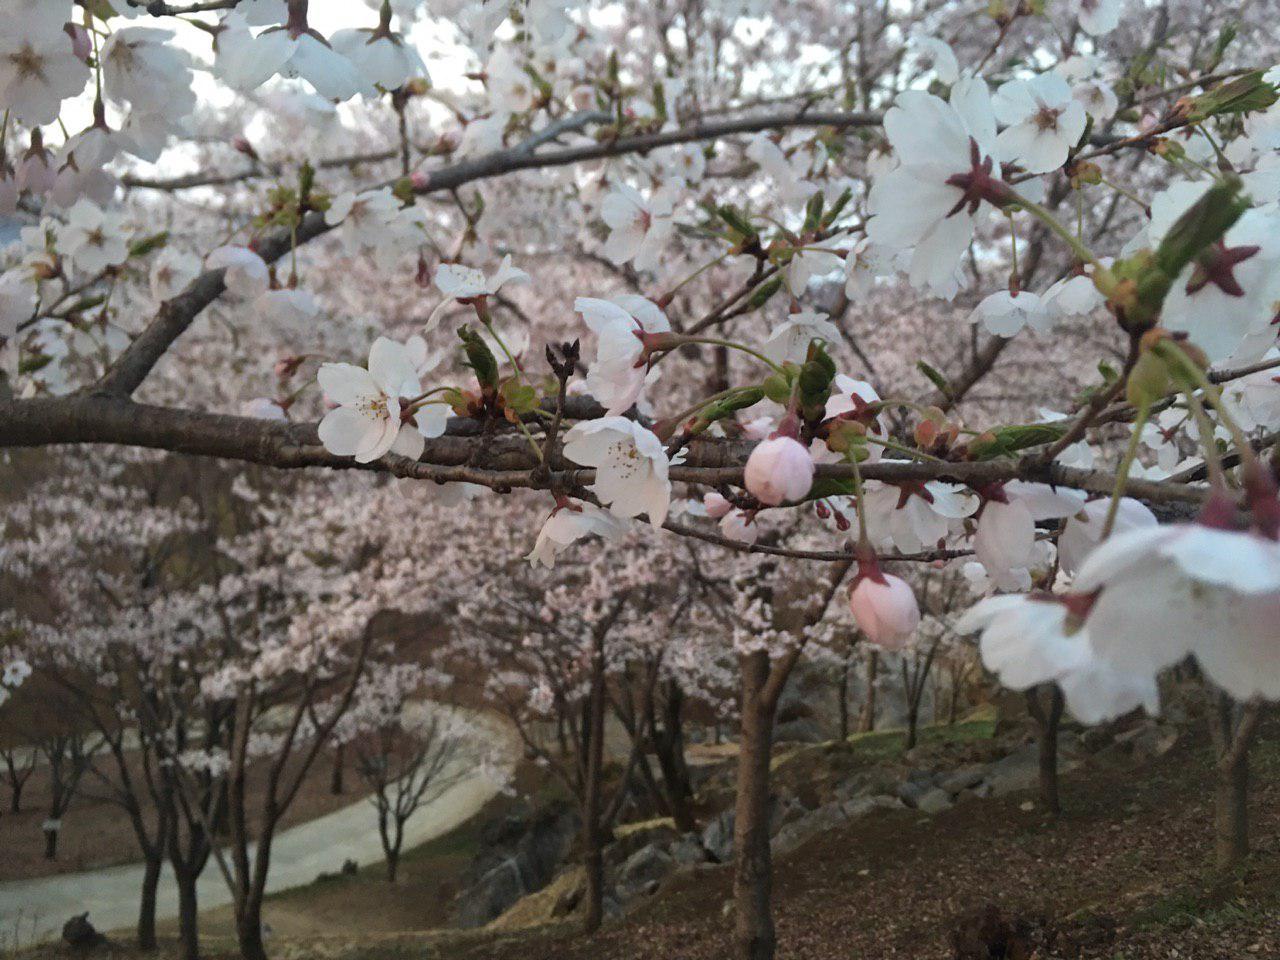 photo_2019-04-19_15-49-41.jpg